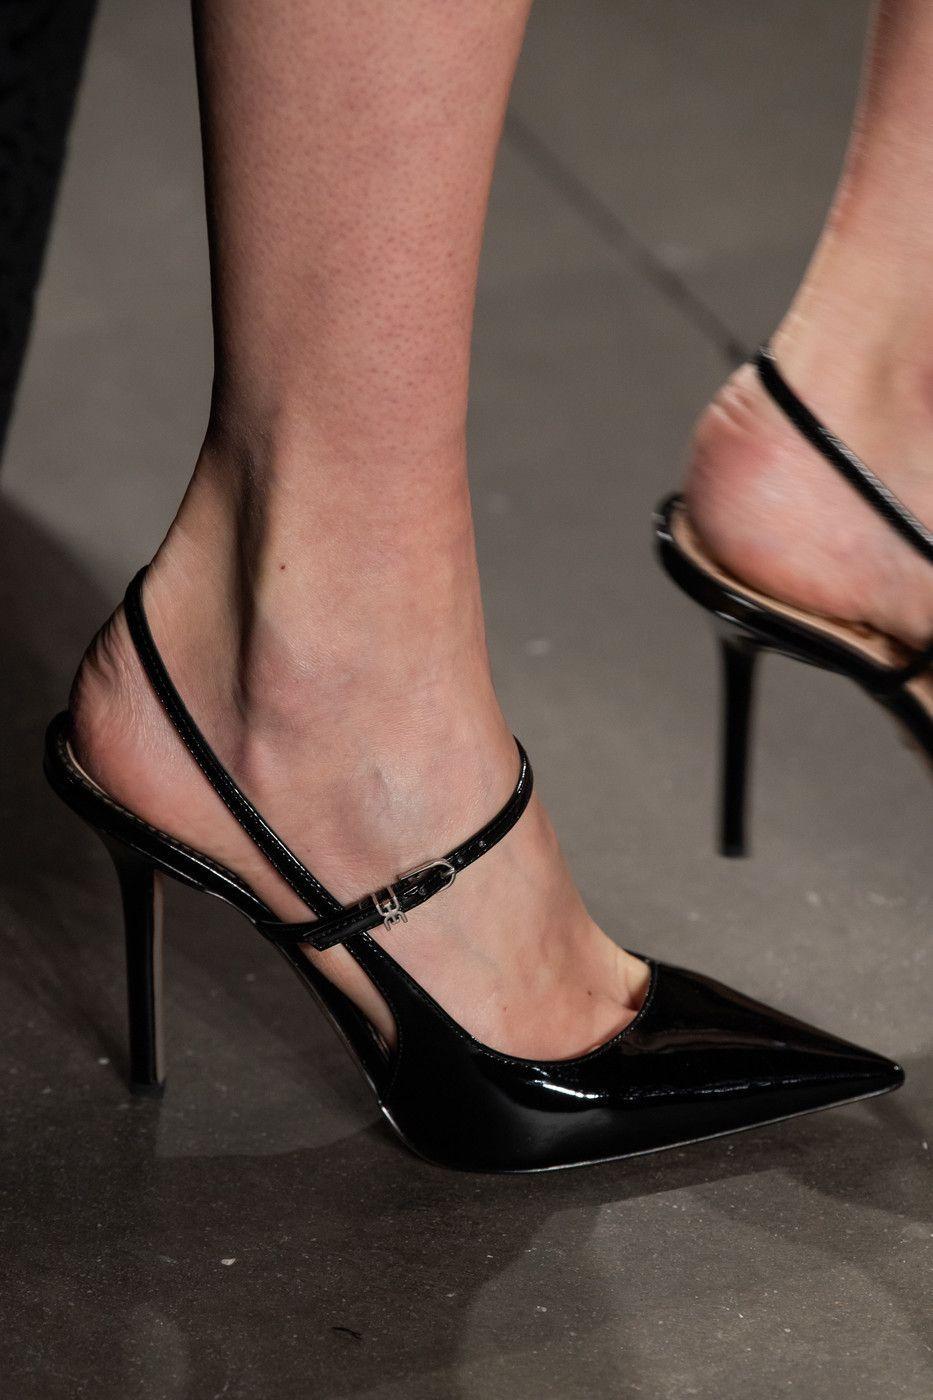 Pamella Roland at New York Fashion Week Fall 2020 -   - #90sRunwayFashion #Fall #Fashion #Pamella #Roland #RunwayFashion2020 #RunwayFashionaesthetic #RunwayFashionchanel #RunwayFashioncrazy #RunwayFashiondior #RunwayFashiondresses #RunwayFashionvogue #RunwayFashionwomen #Week #York